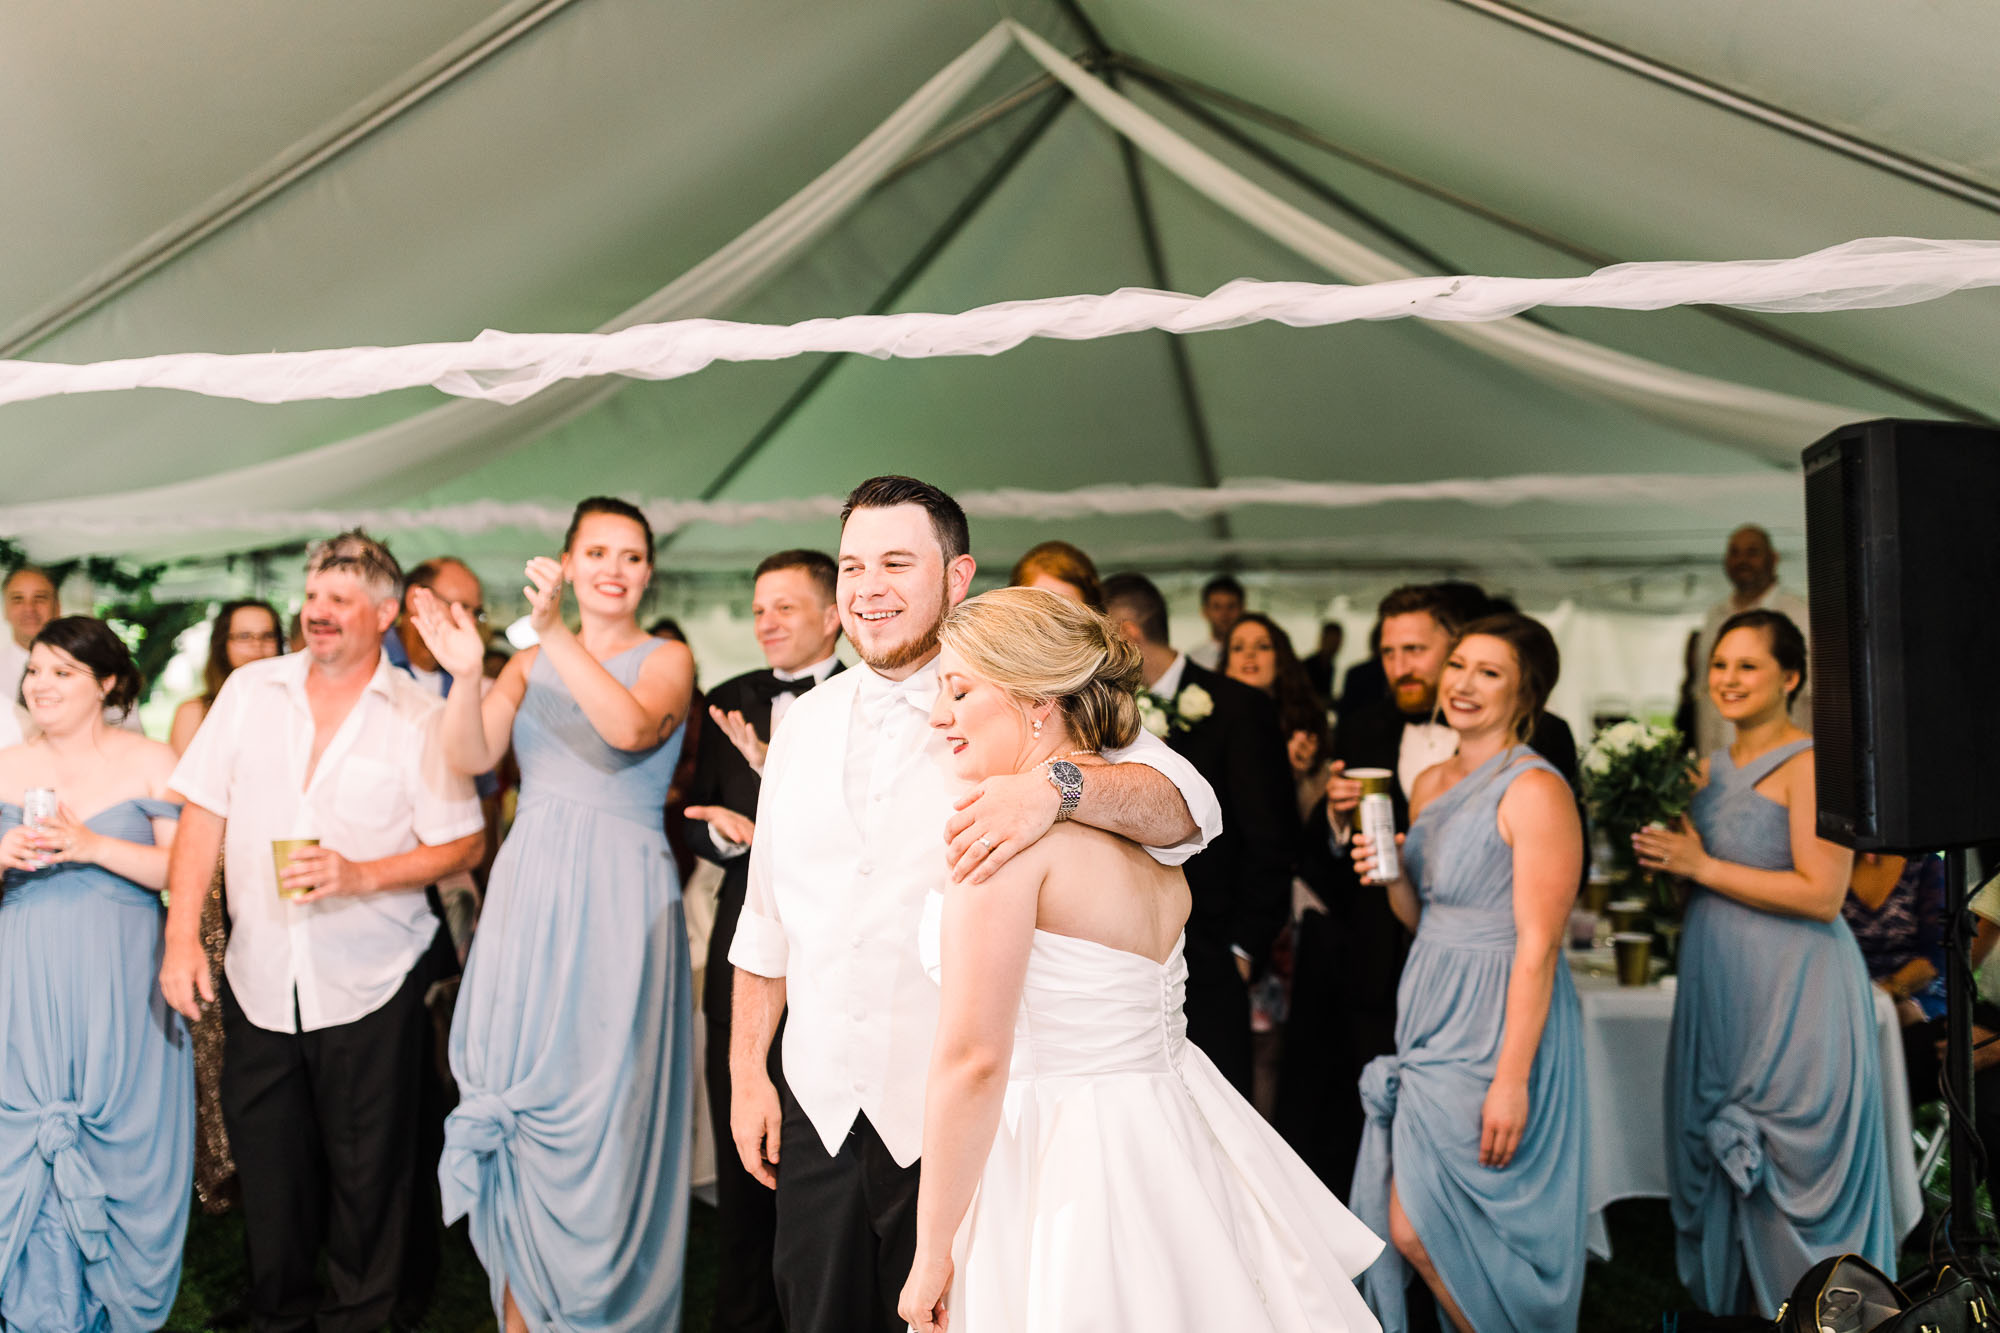 isle-of-que-wedding-7079.jpg